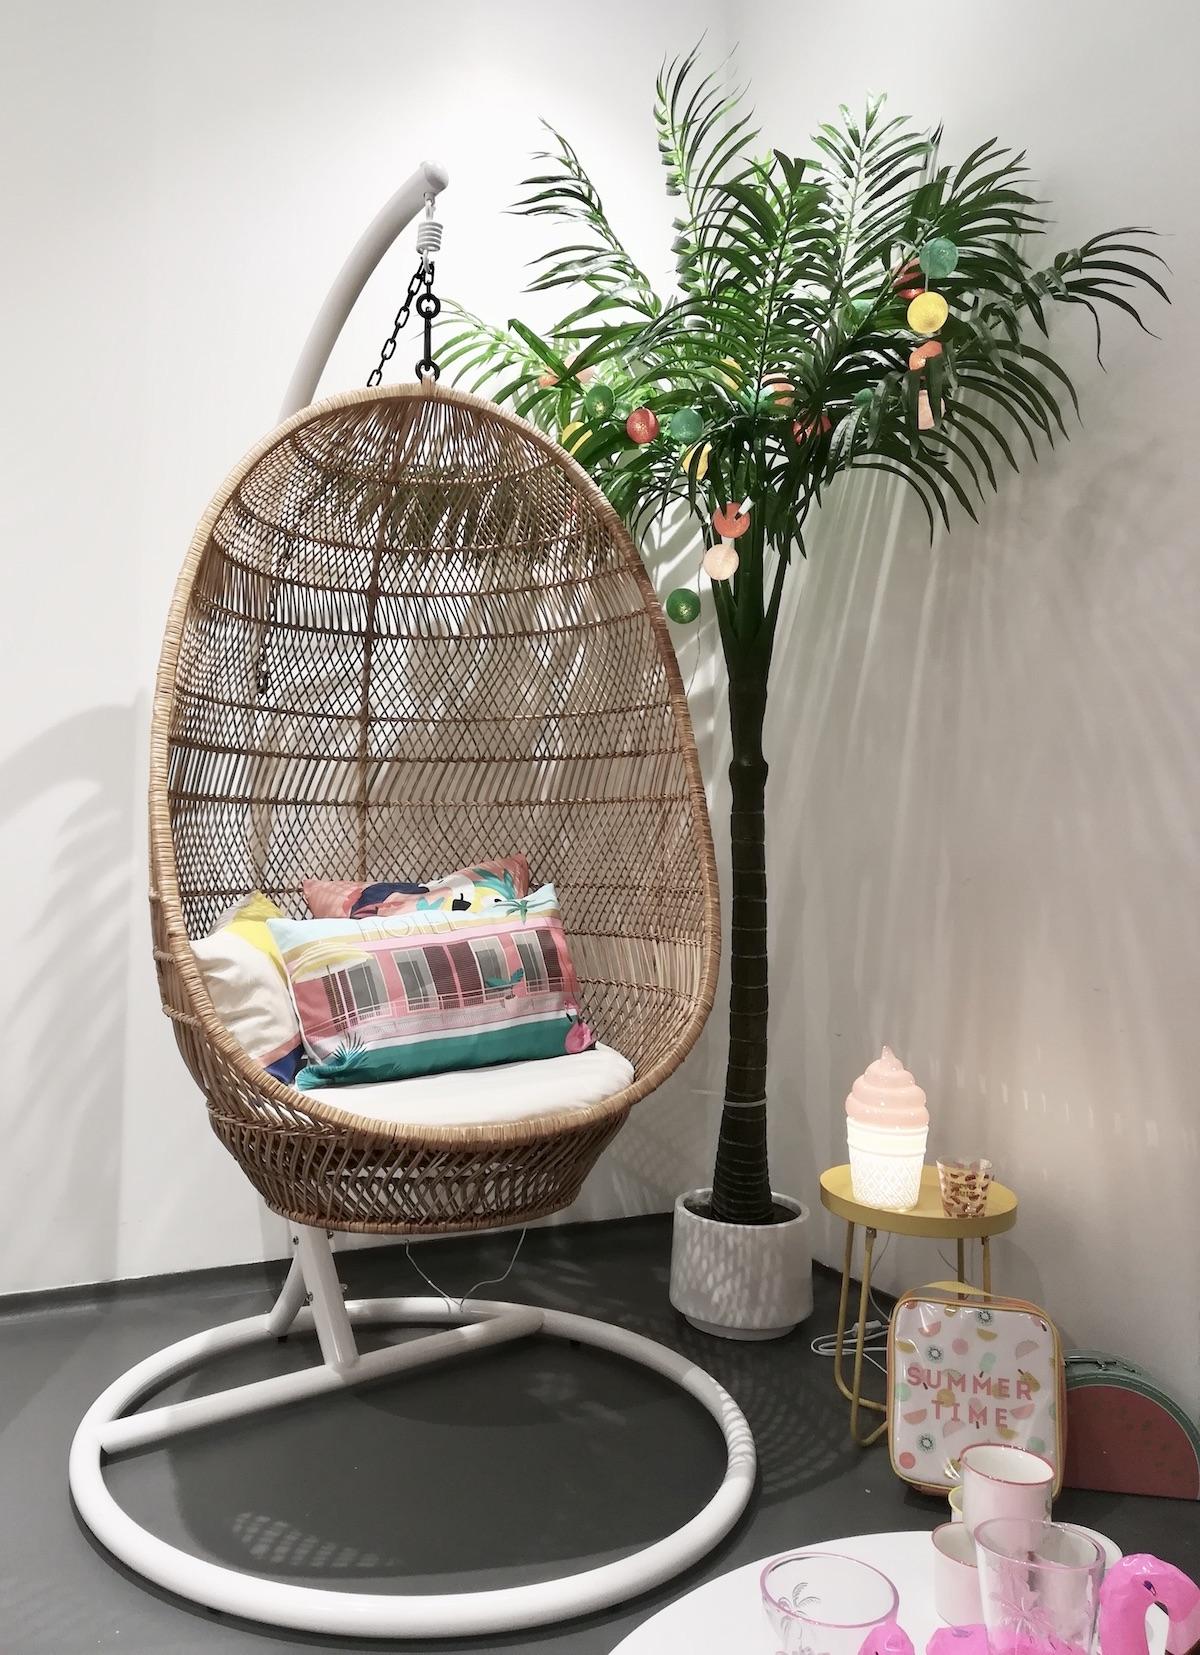 fauteuil suspendu rotin osier pied blanc jardin terrasse chambre ado